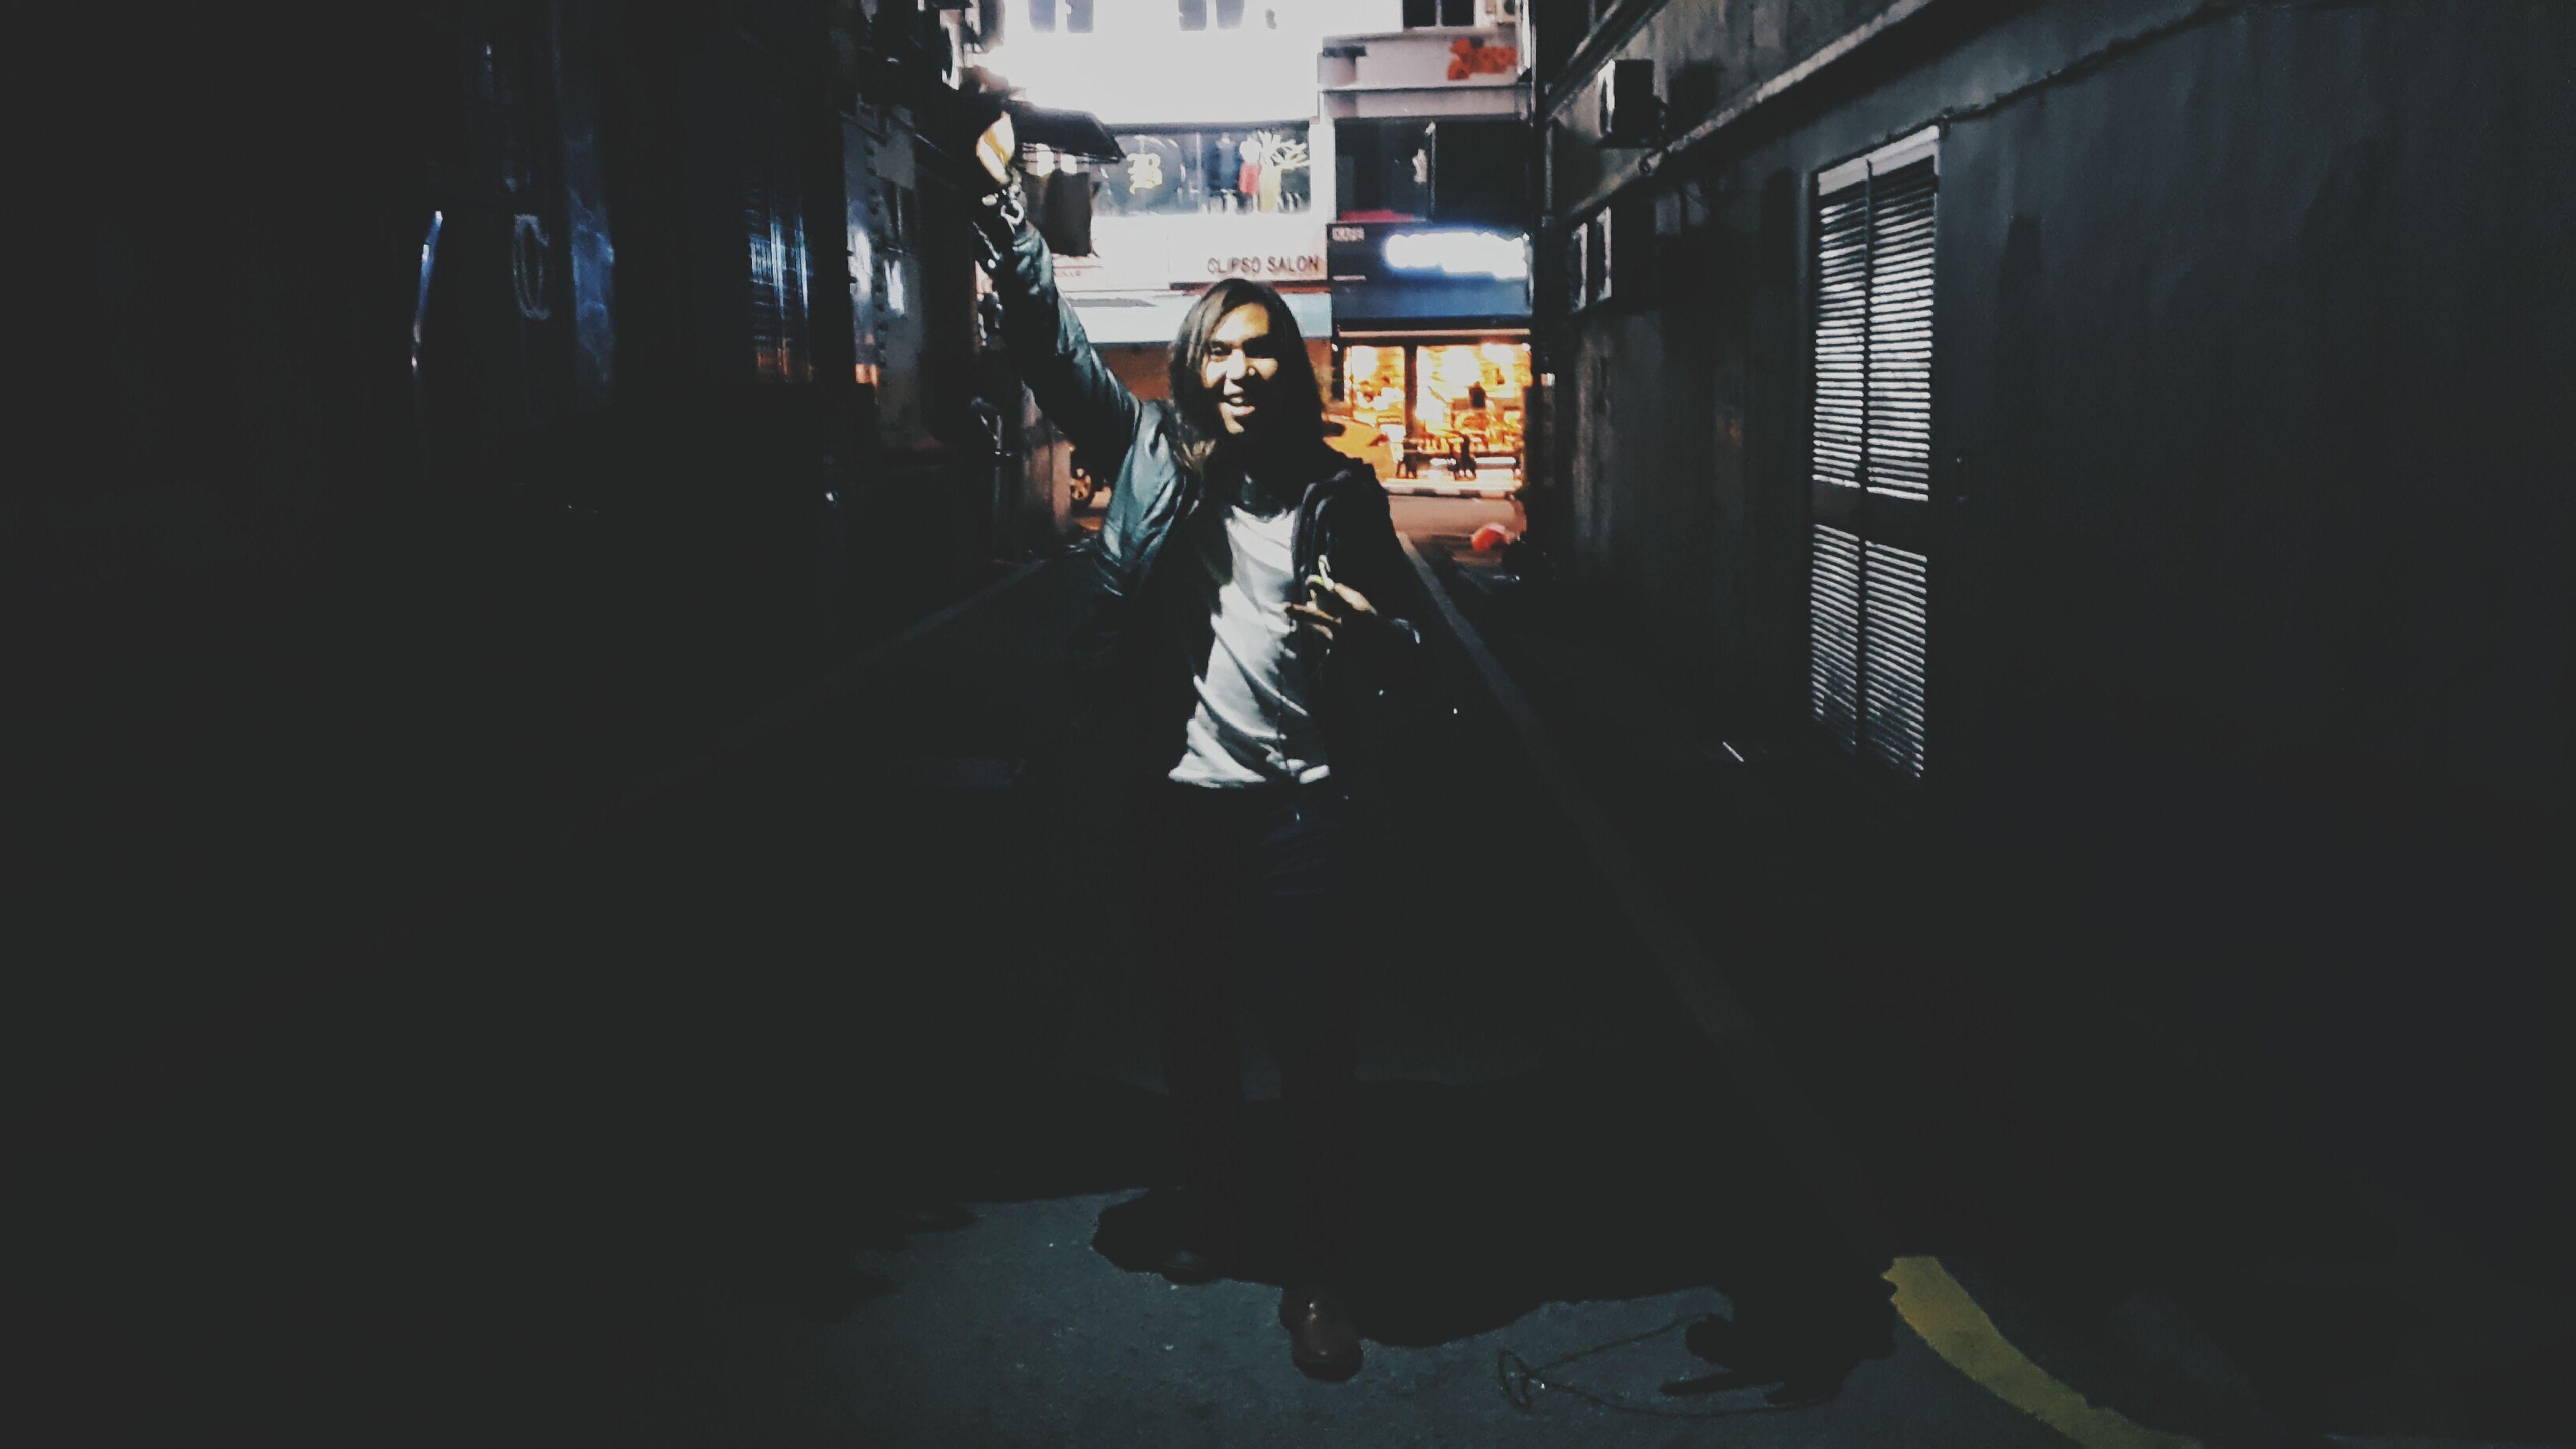 Hangout Street Photography Rockon Chilling